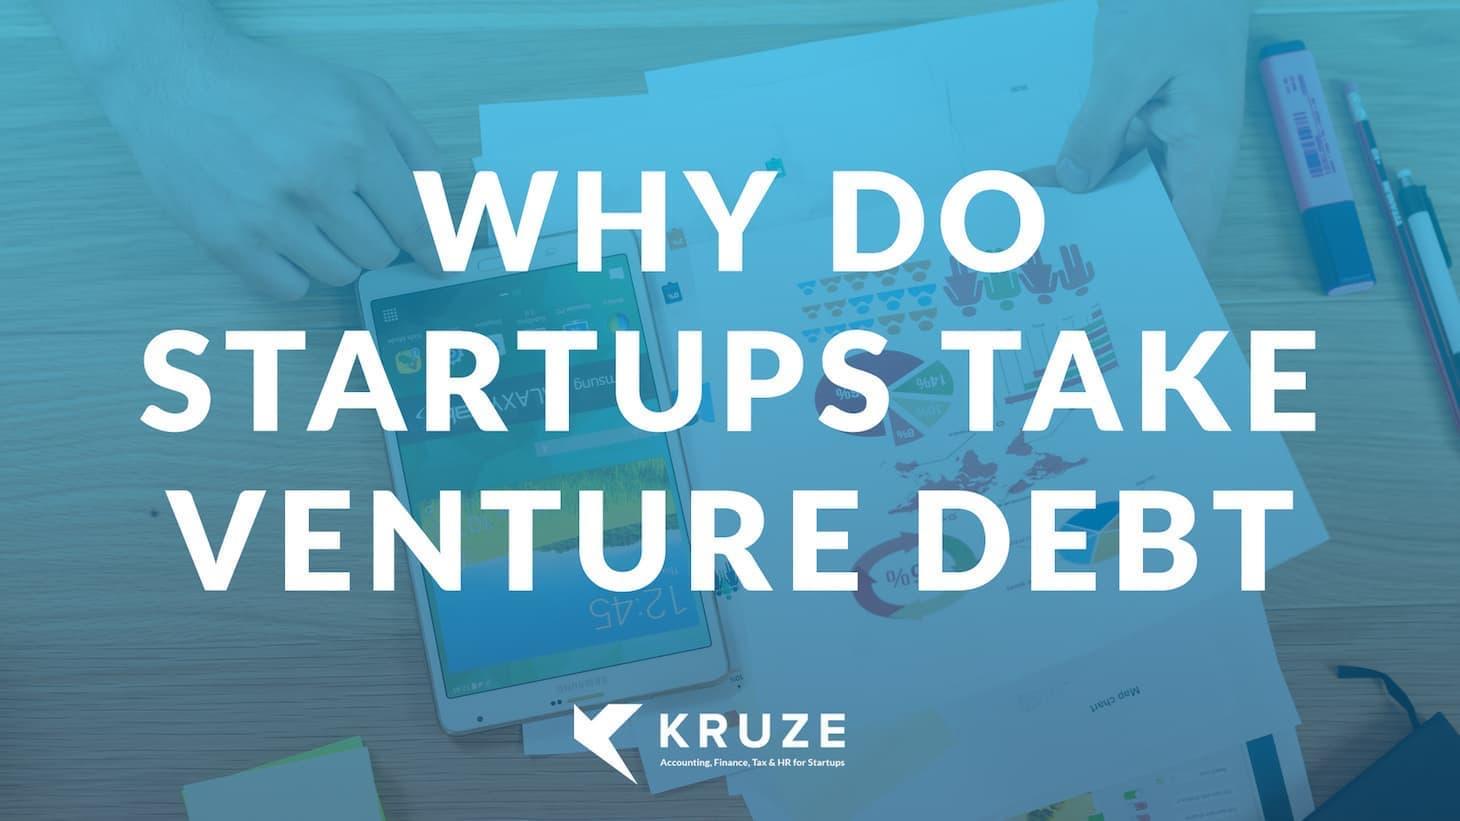 Why Do Startups Take Venture Debt?